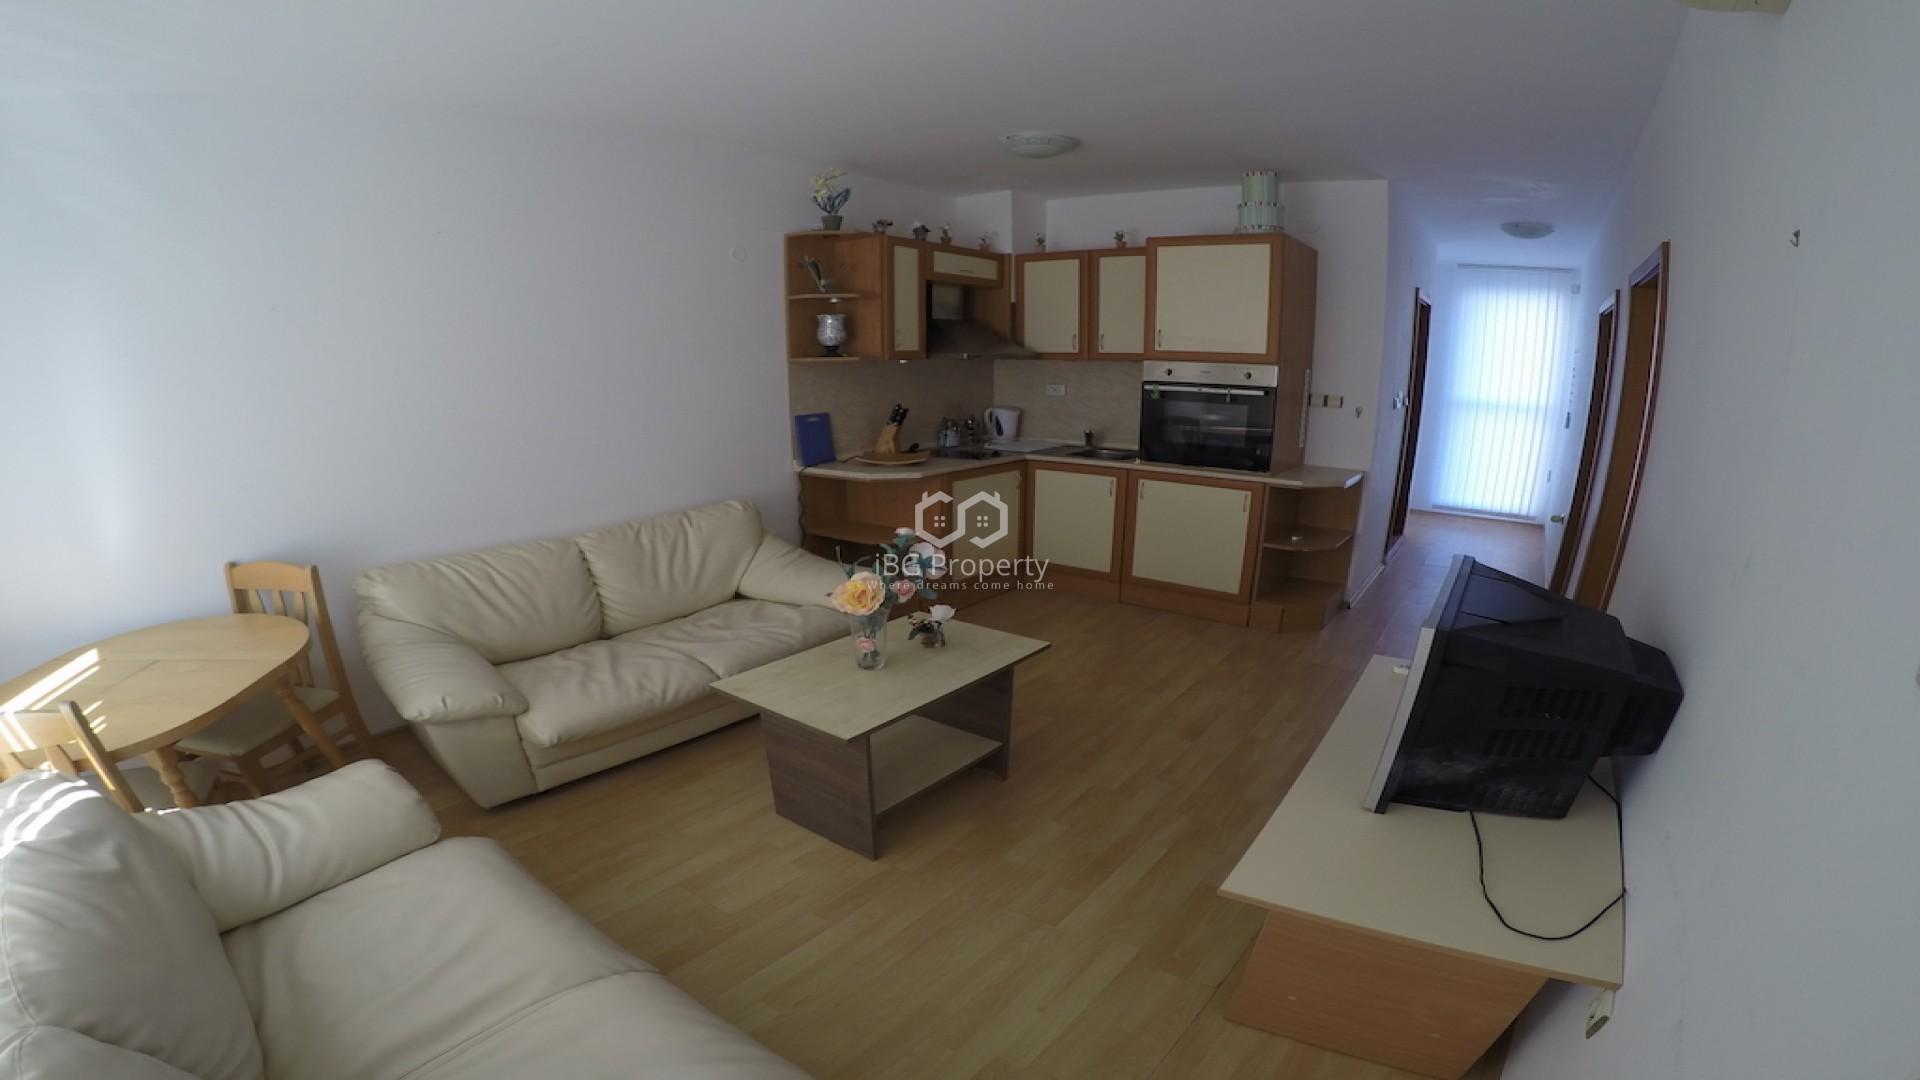 Tристаен апартамент Слънчев Бряг 69 m2